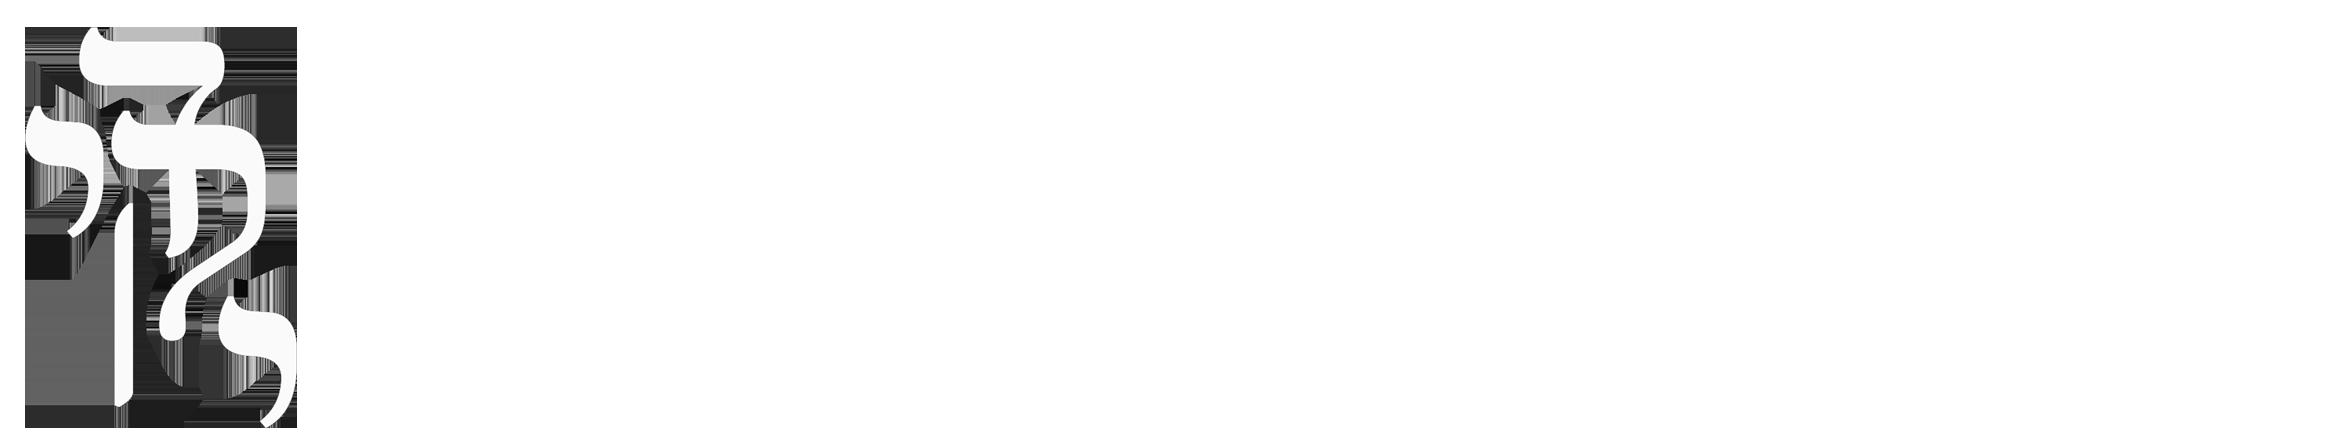 davidawillson.com